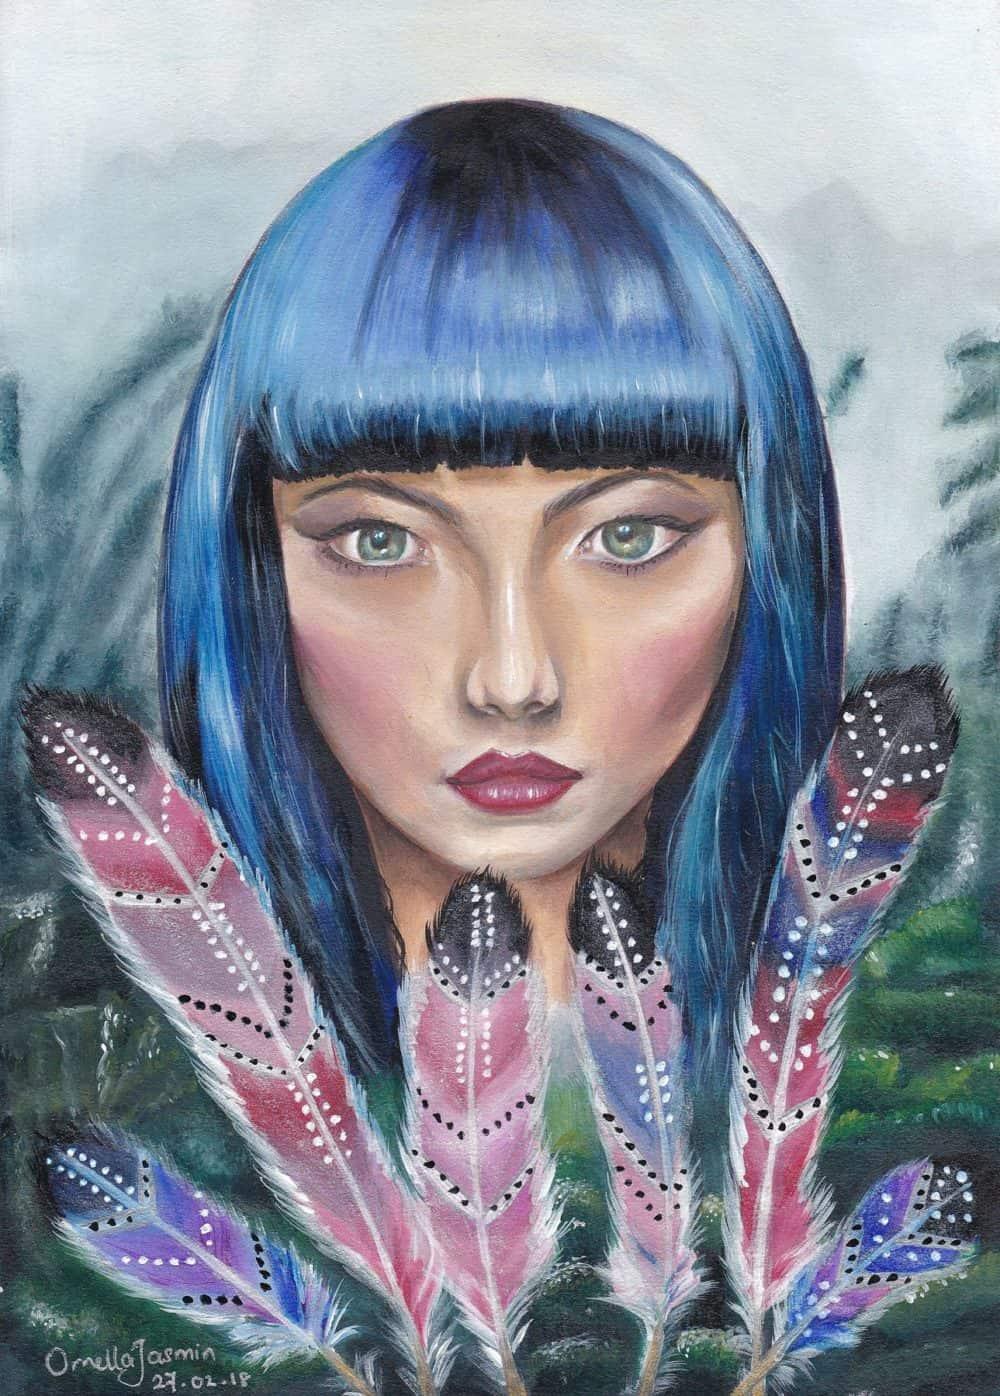 mauritius-arts-ornella-jasmin-feathers